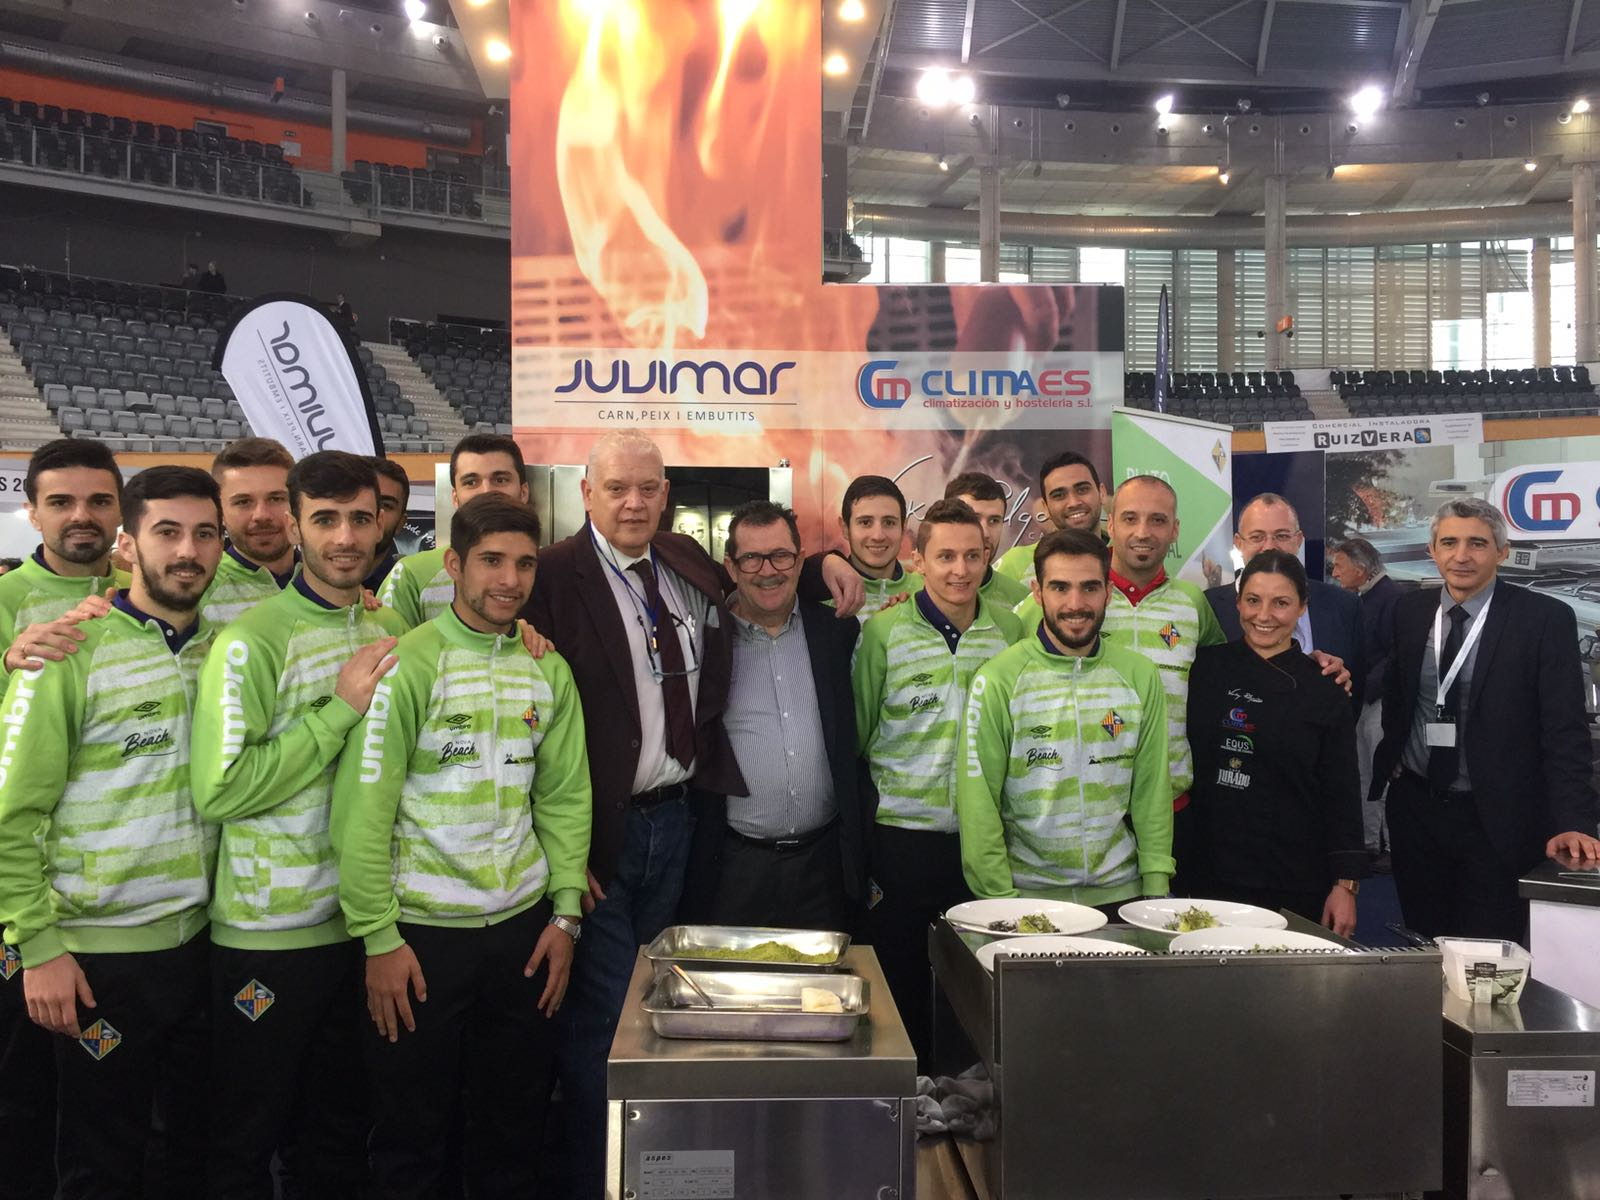 La plantilla del Palma Futsal estrenó su tapa en el stand de Juvimar 2